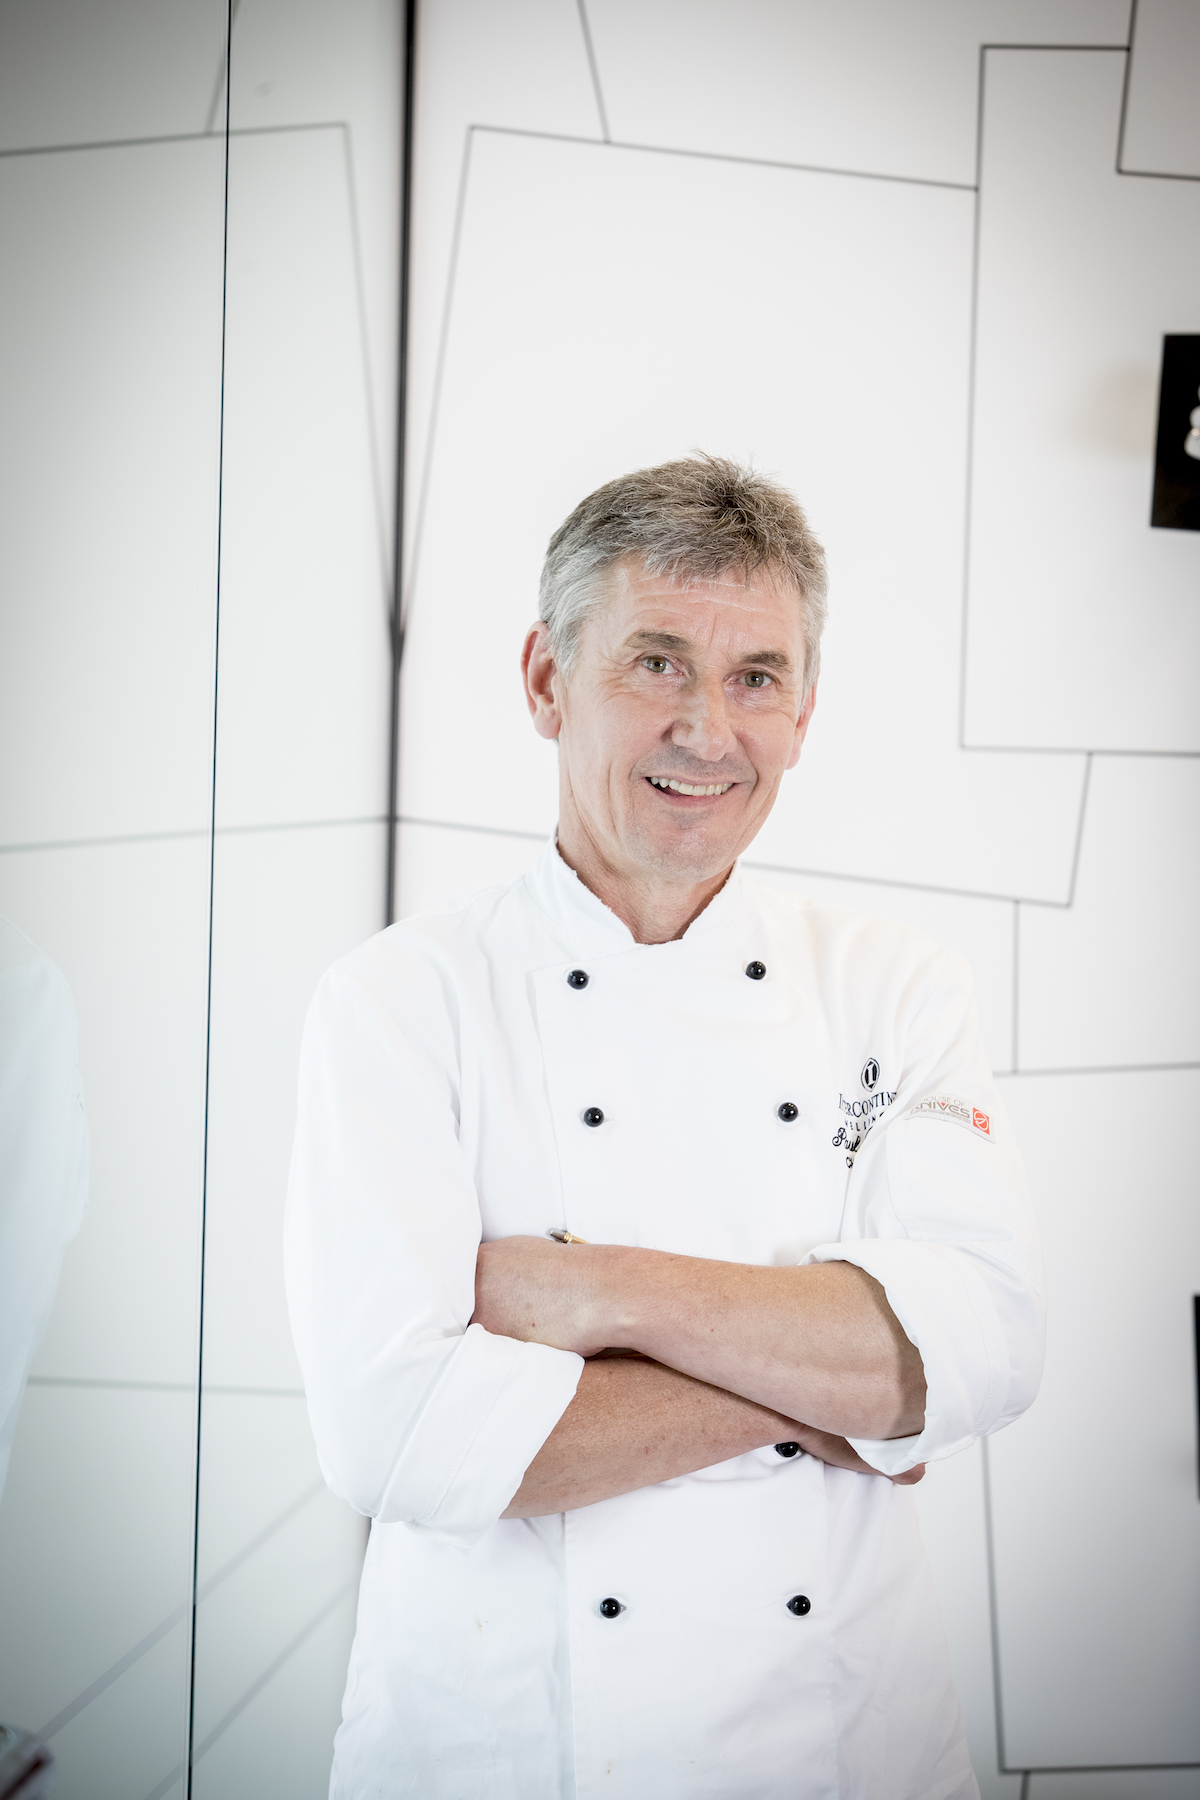 Chameleon Restaurant chef de cuisine Paul Limacher